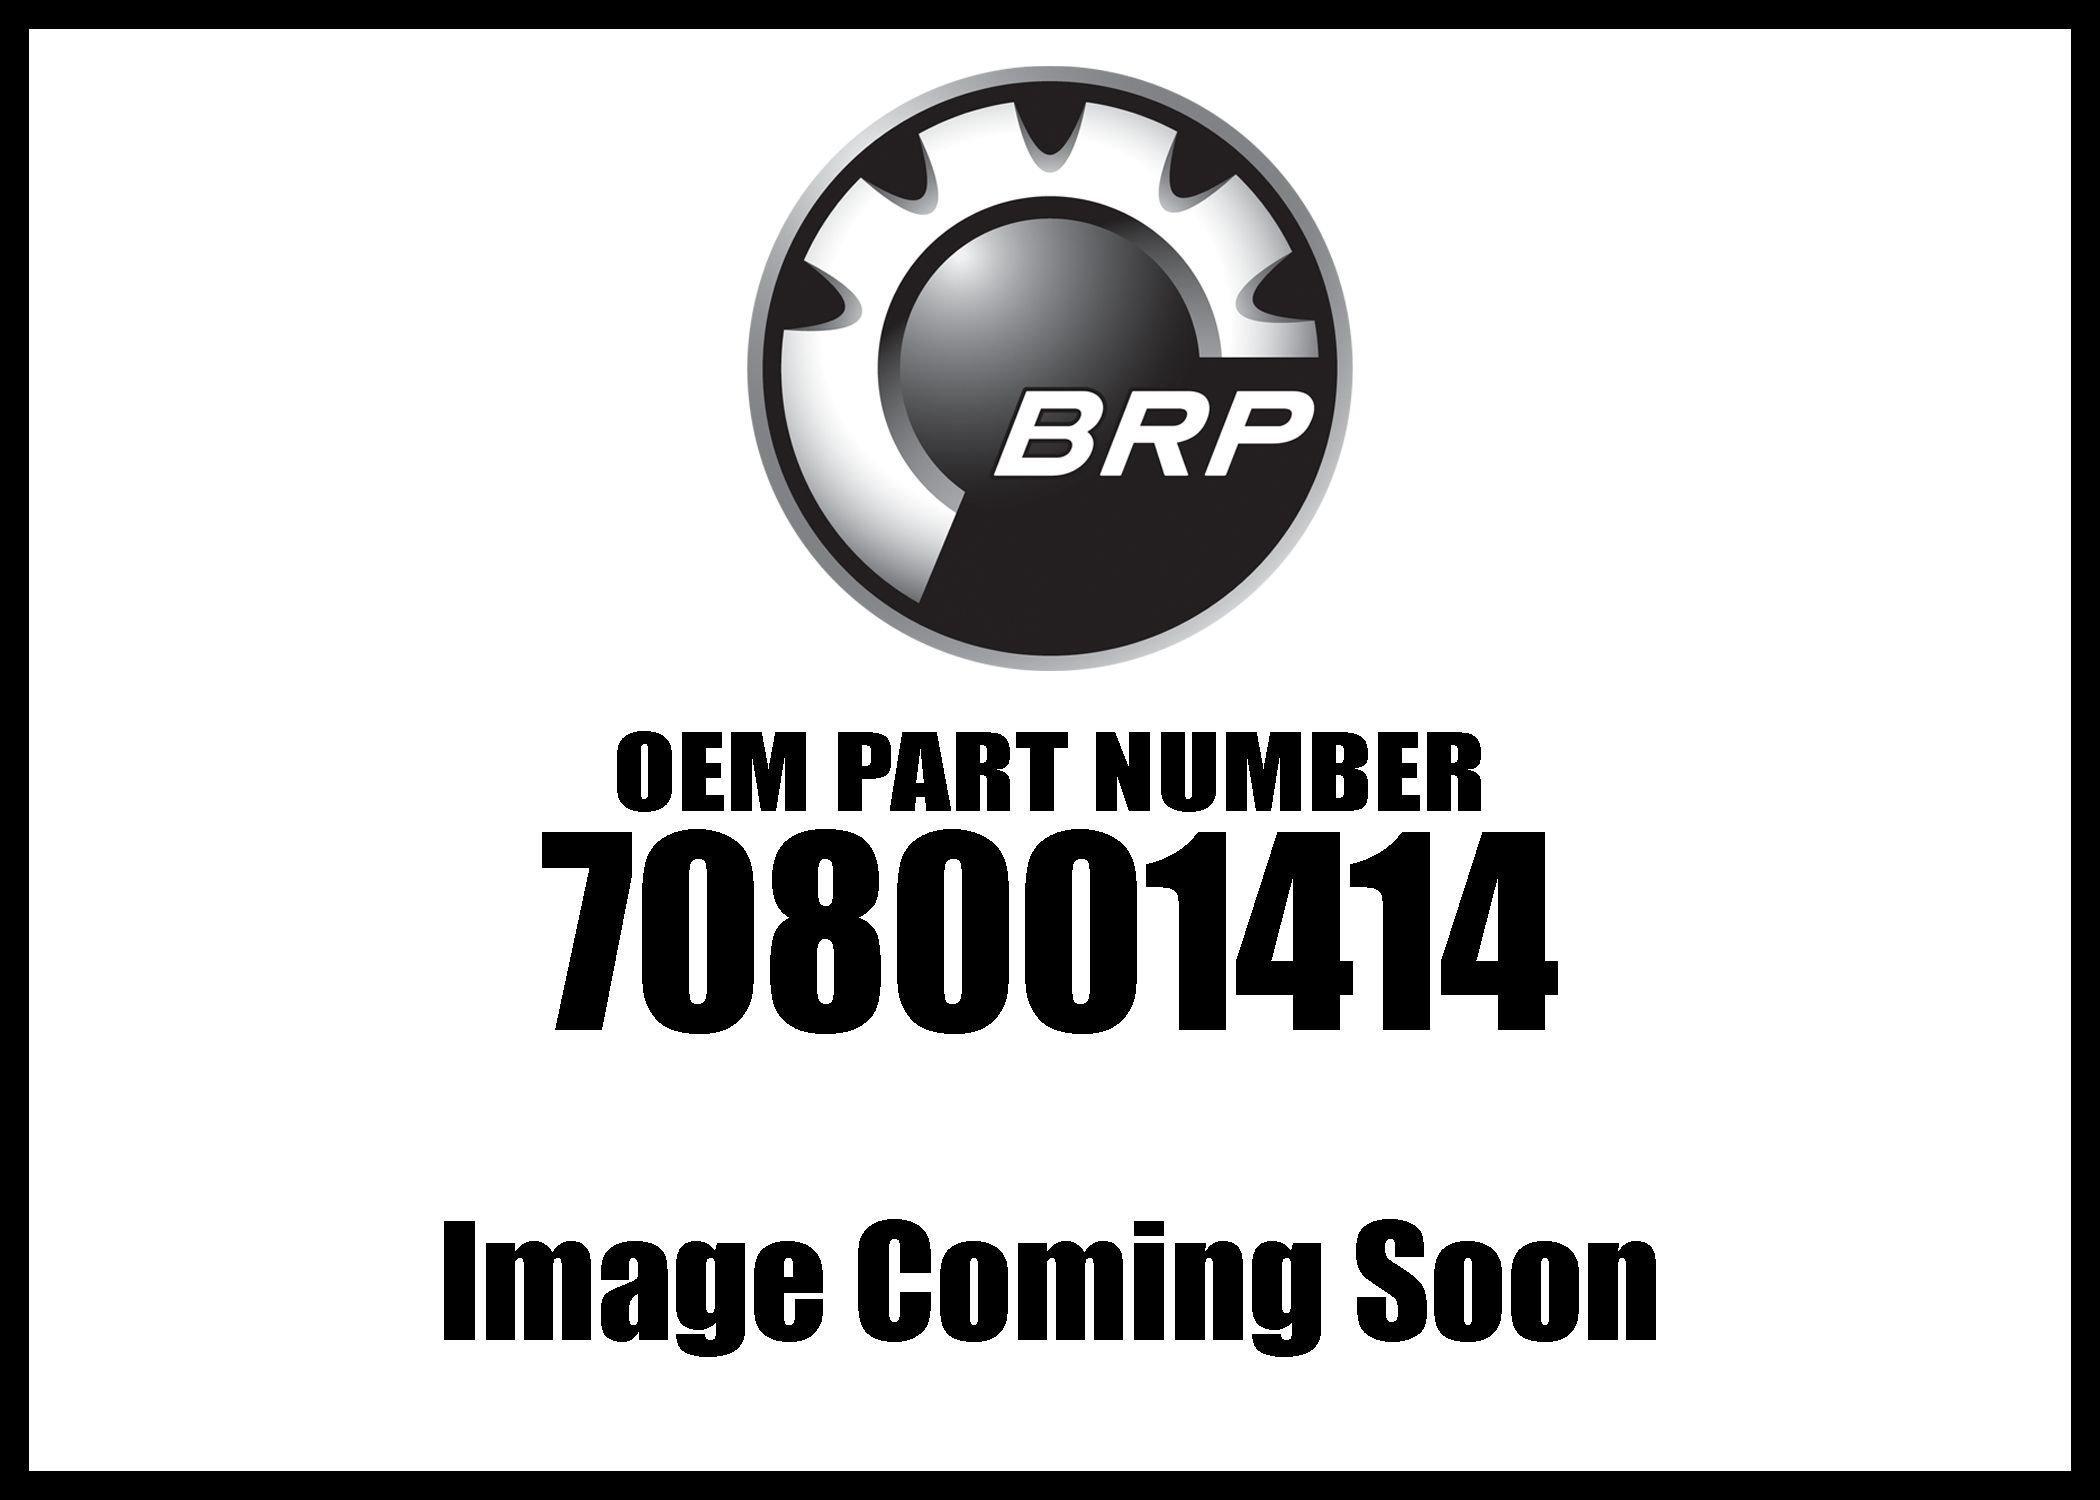 Spyder 2015-2018 F3 Poignee Droite Rh Handle 708001414 New Oem